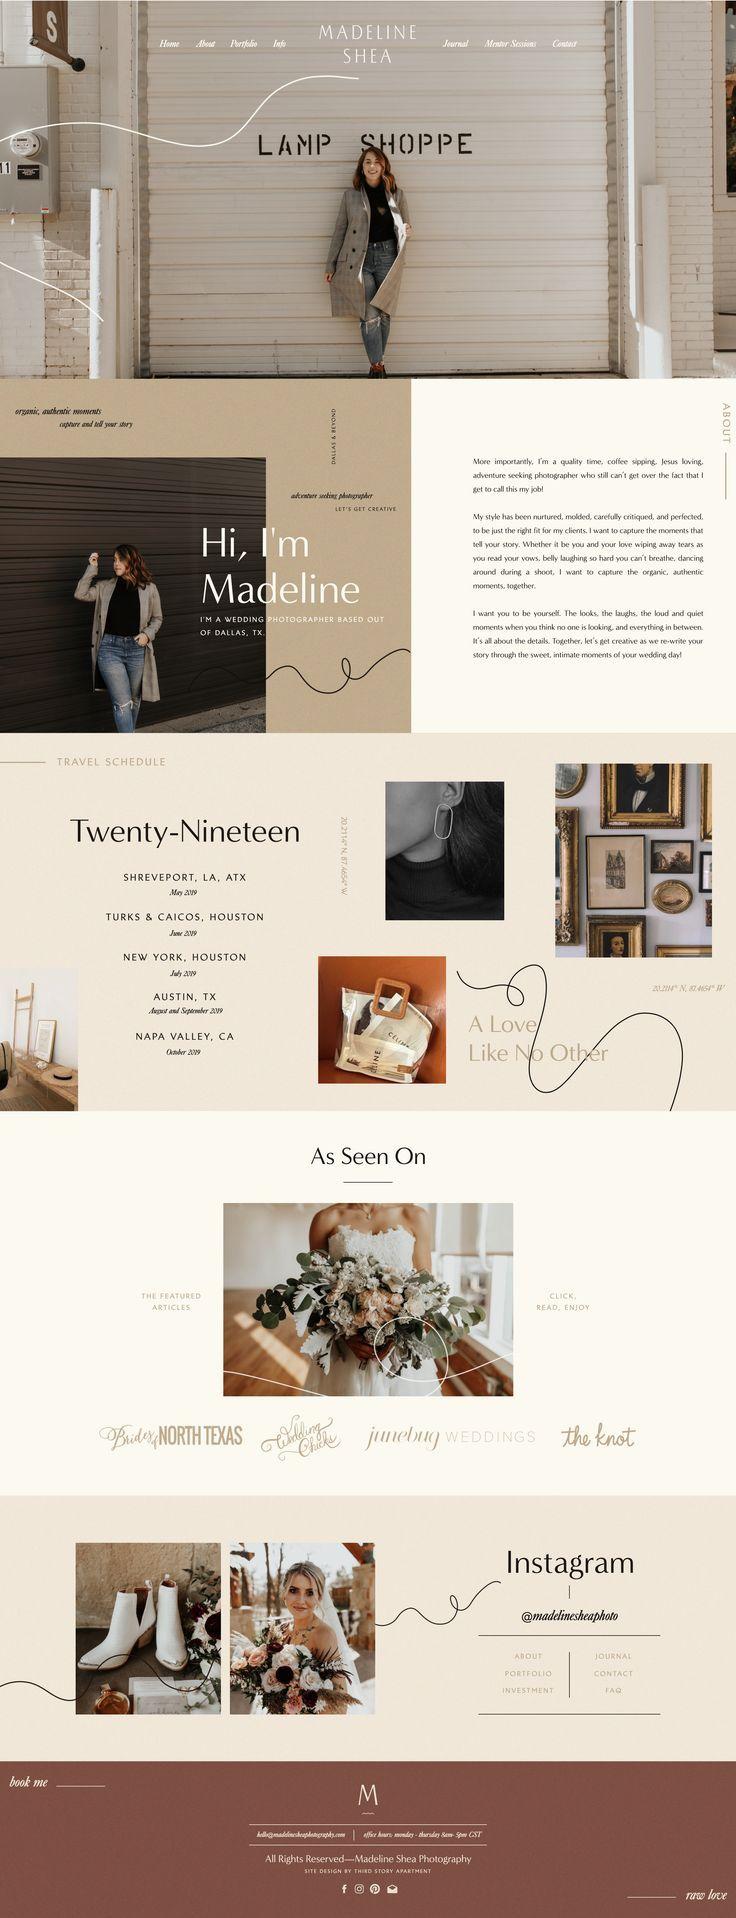 Website Design By Lindsey Eryn Of Third Story Apartment Ig Lindseyeryn Thirdstoryapt Portfolio Website Design Website Design Layout Modern Website Design